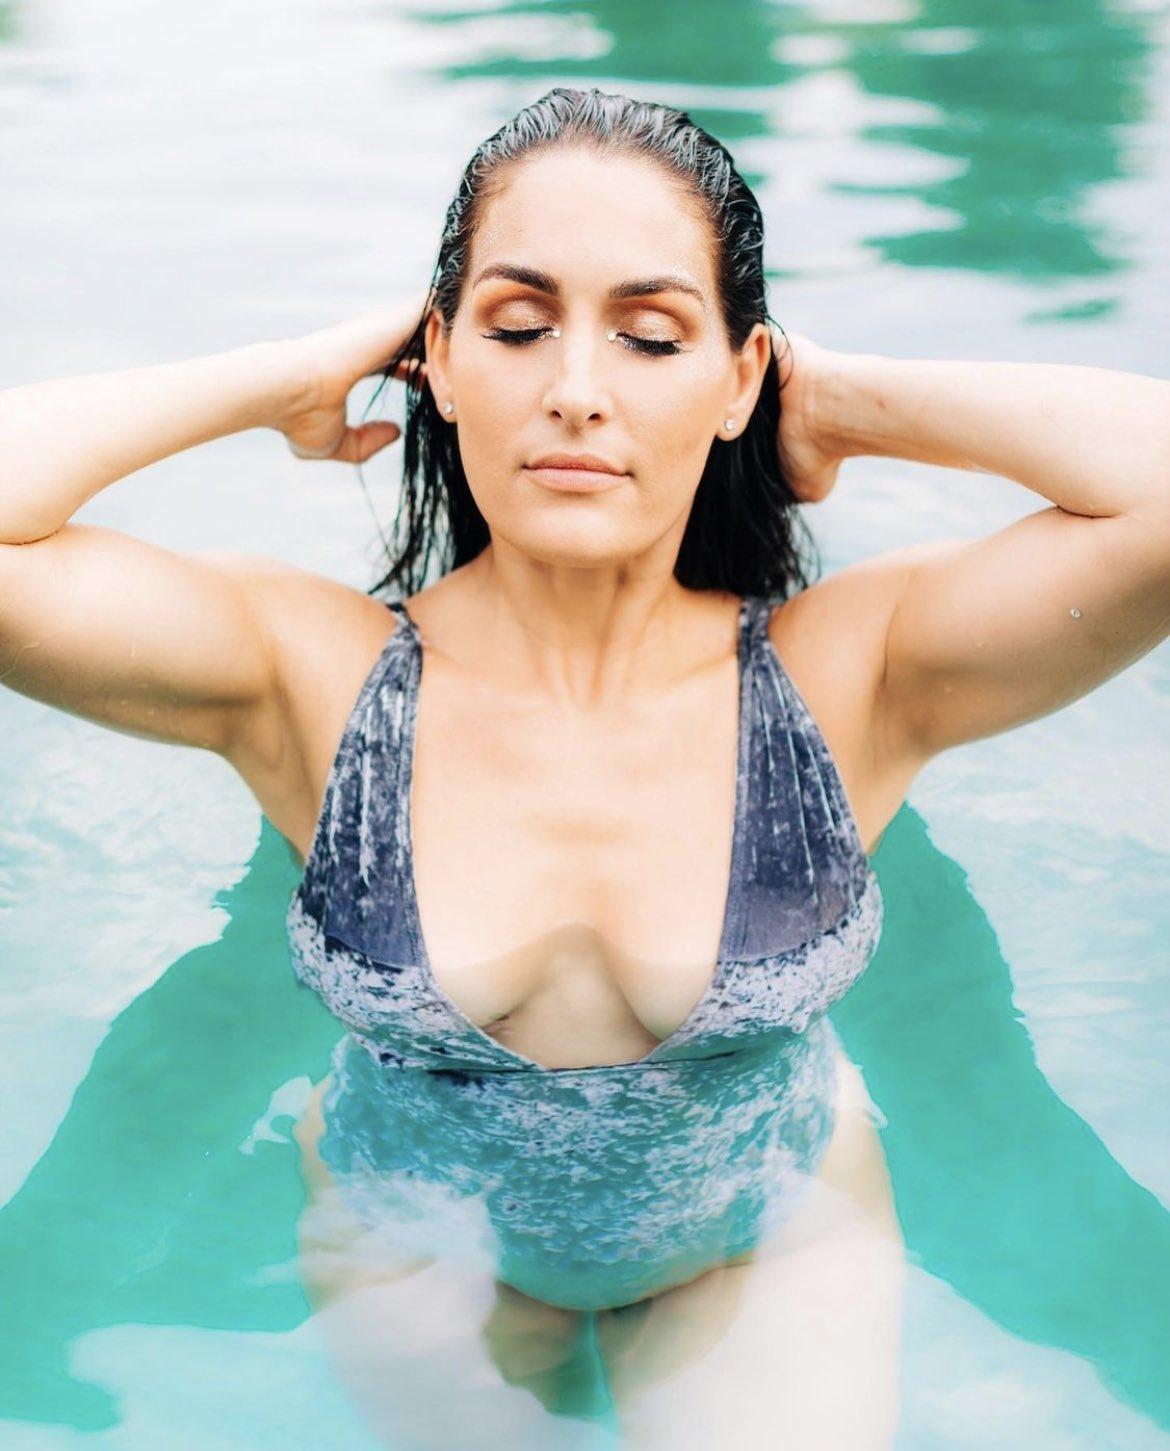 Photos: Nikki Bella Spreads Summer Vibes Ahead Of WWE Summerslam 2021 155